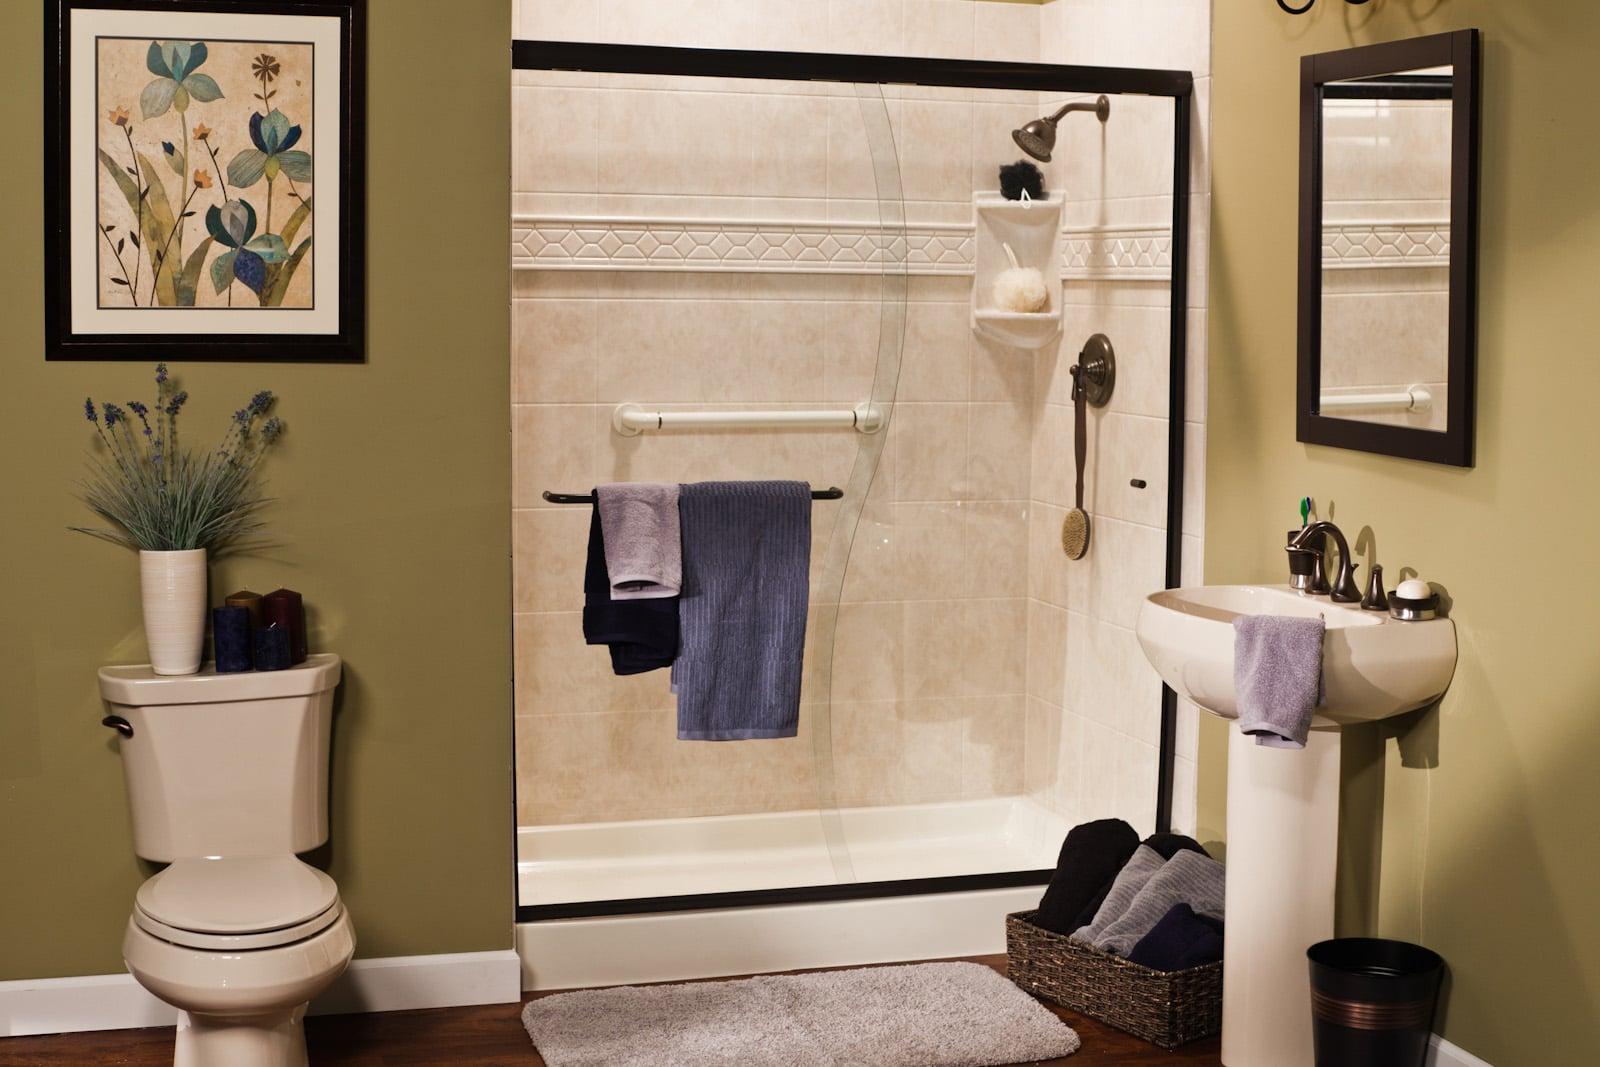 South Florida Tub to Shower Conversions - Bathrooms Plus Inc (9)